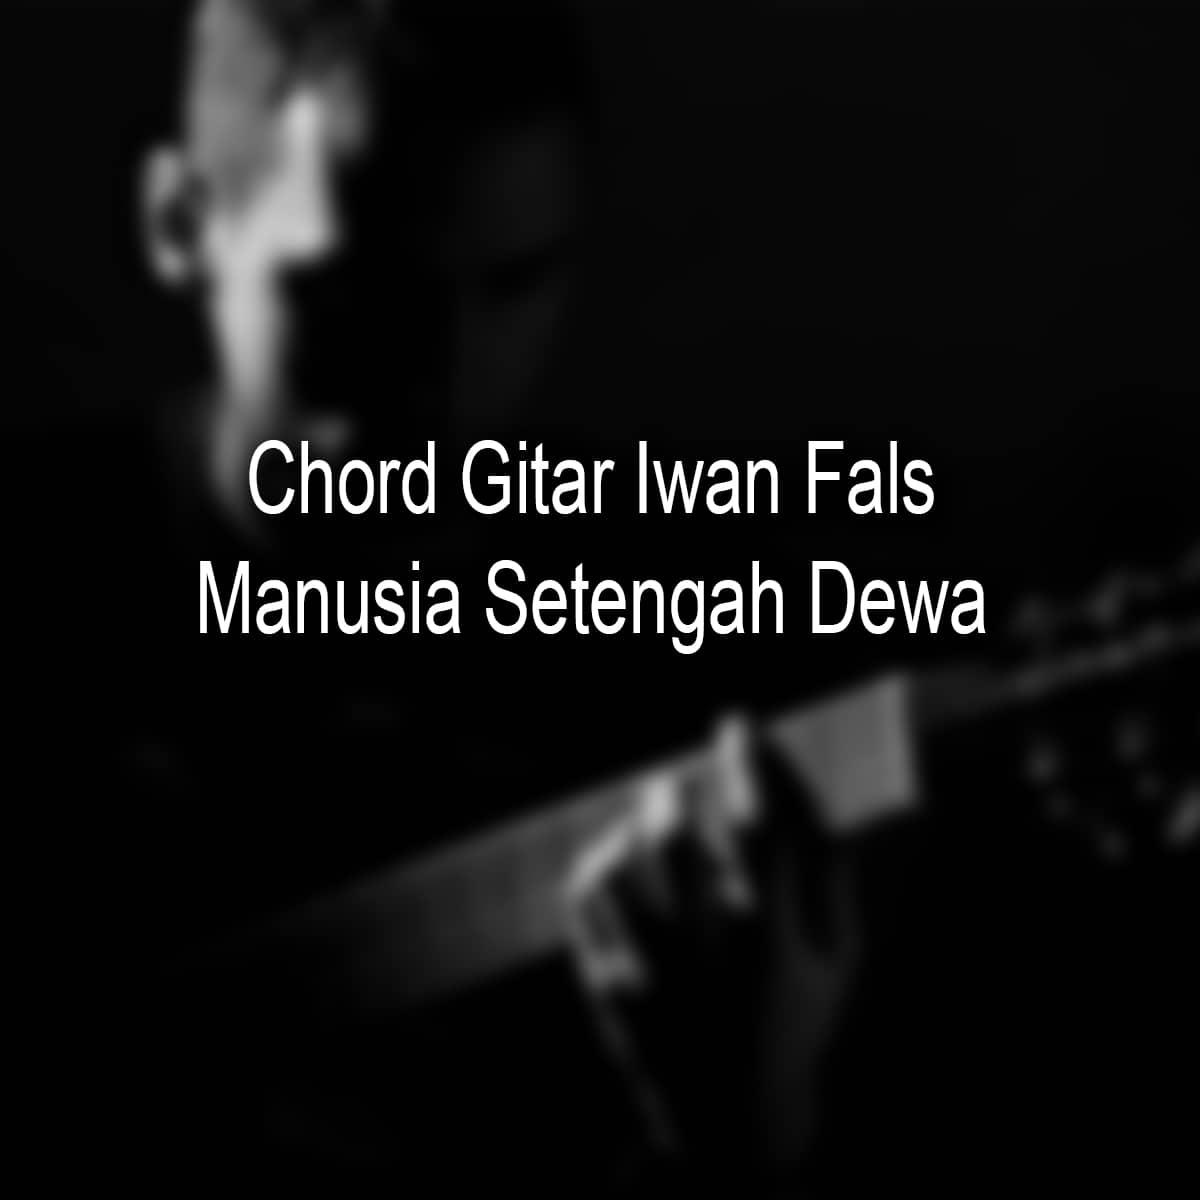 Chord Gitar Iwan Fals Manusia Setengah Dewa